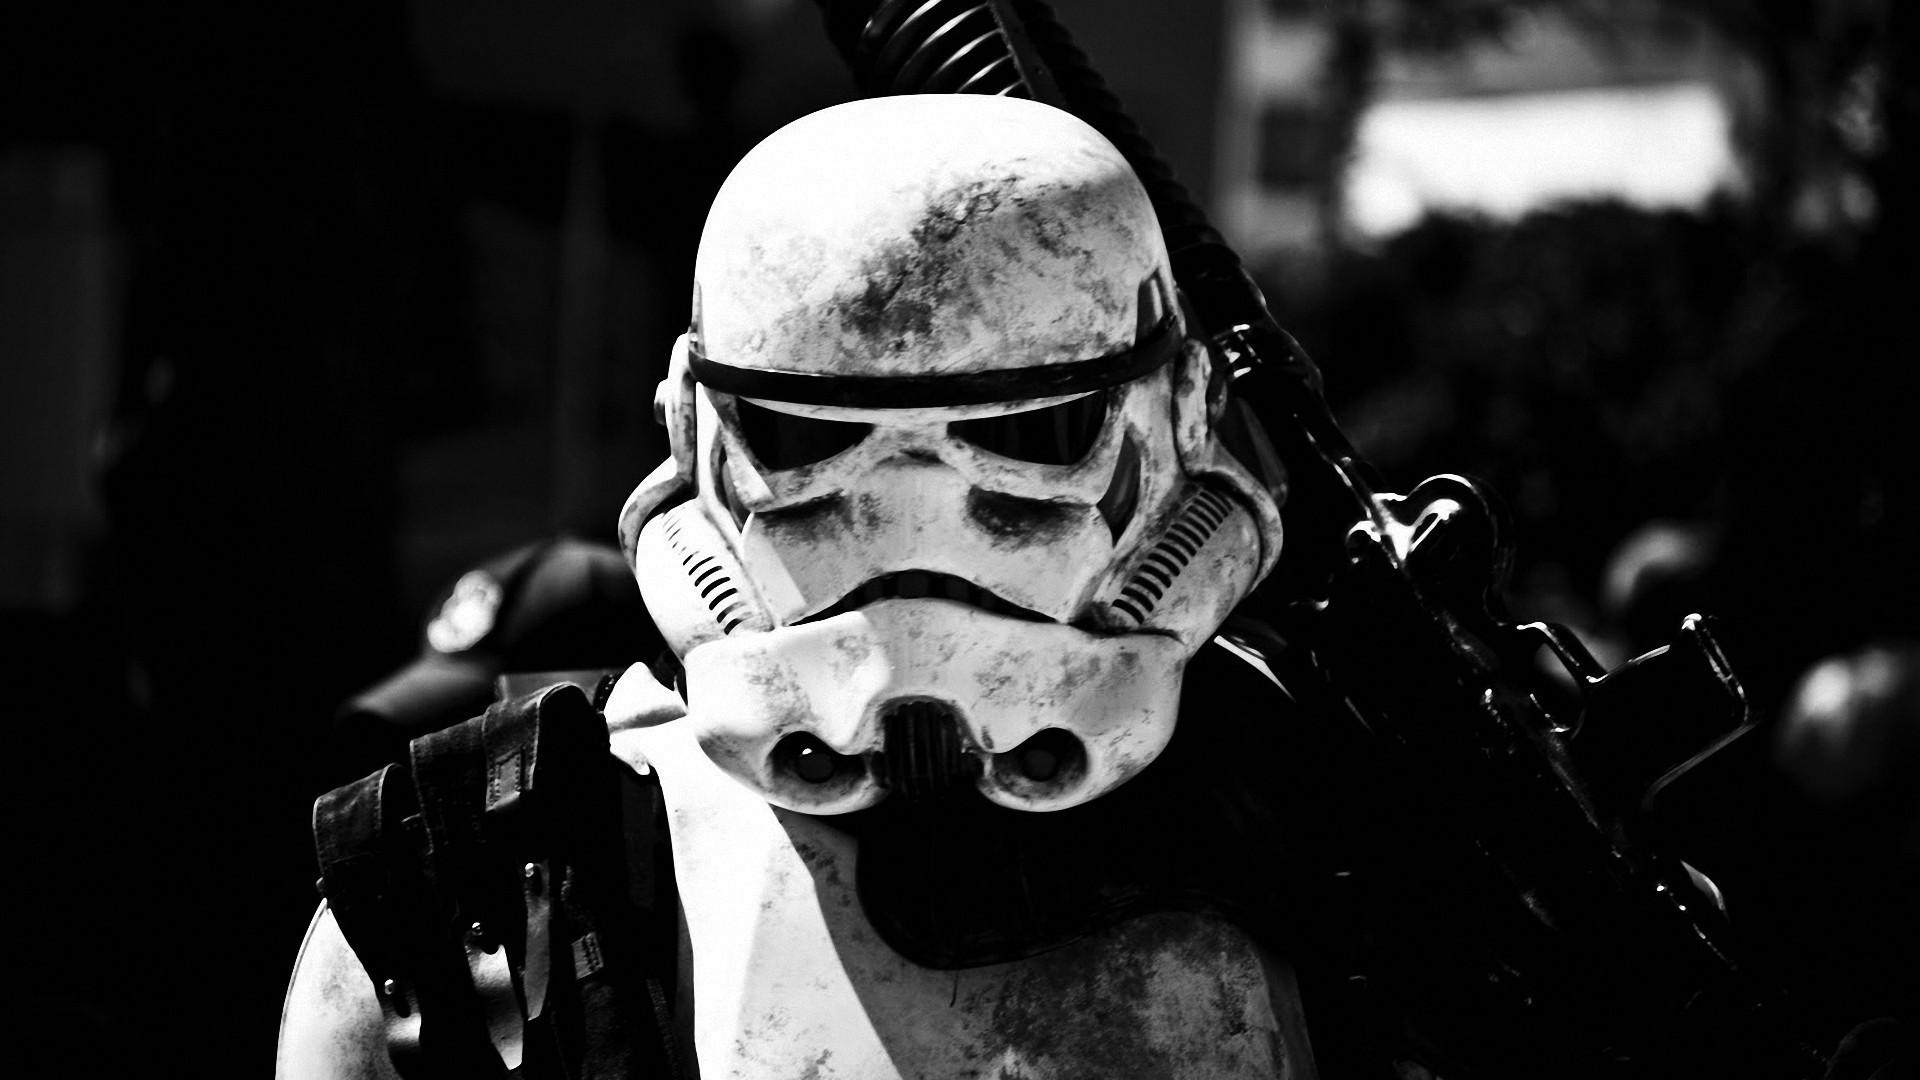 audi stormtroopers РGoogle keres̩s